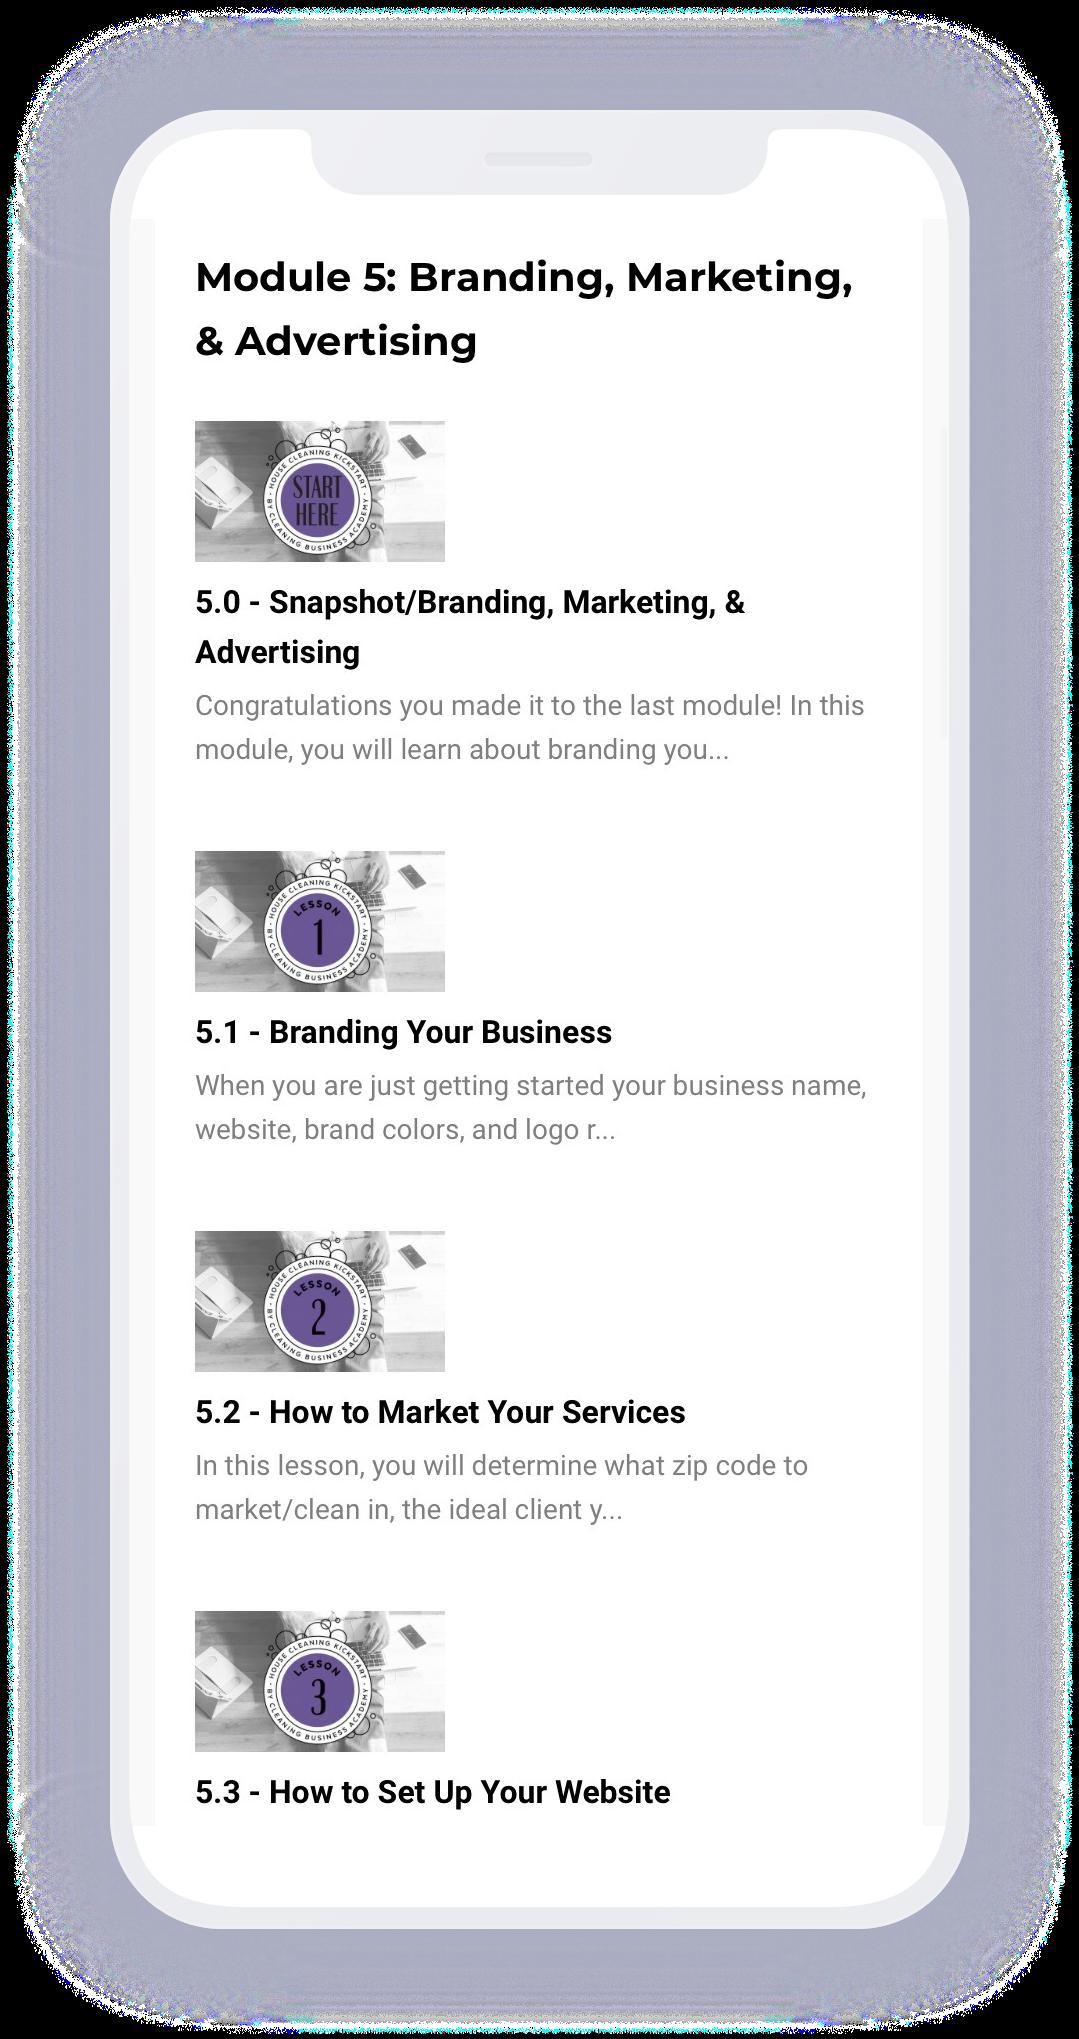 Branding, Marketing, and Advertising